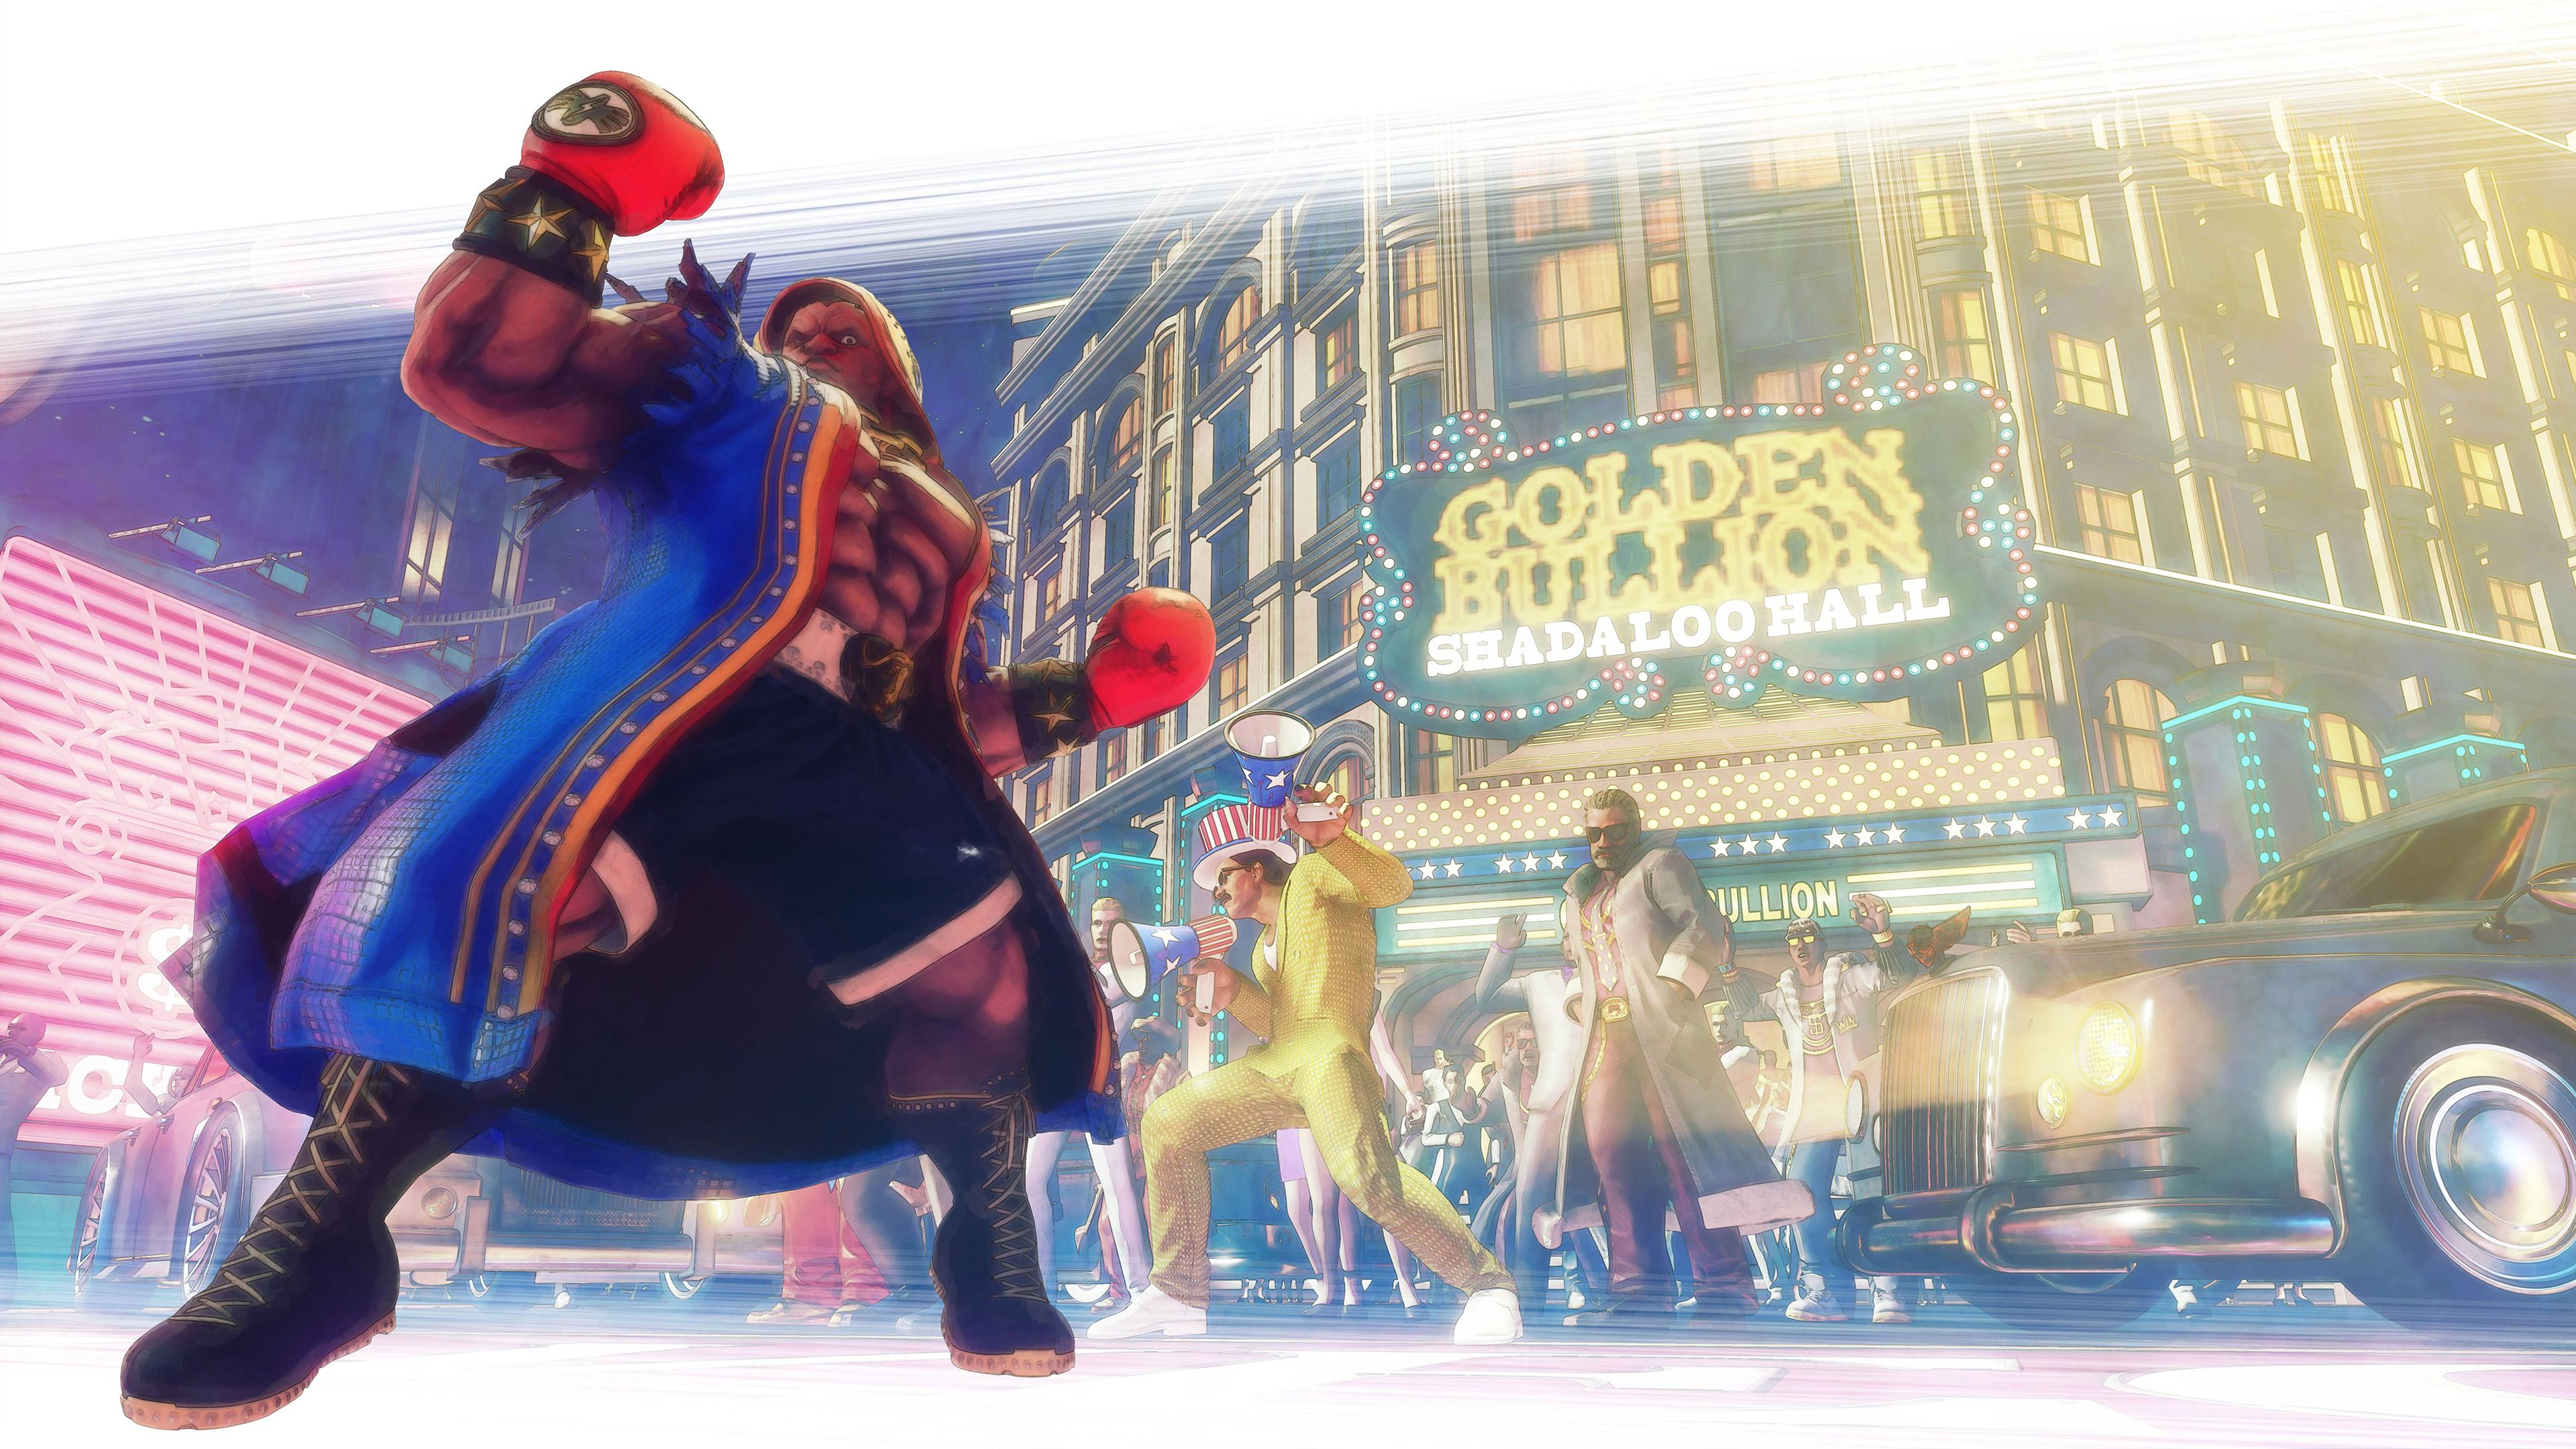 2016 Street Fighter V, HD Games, 4k Wallpapers, Images ...